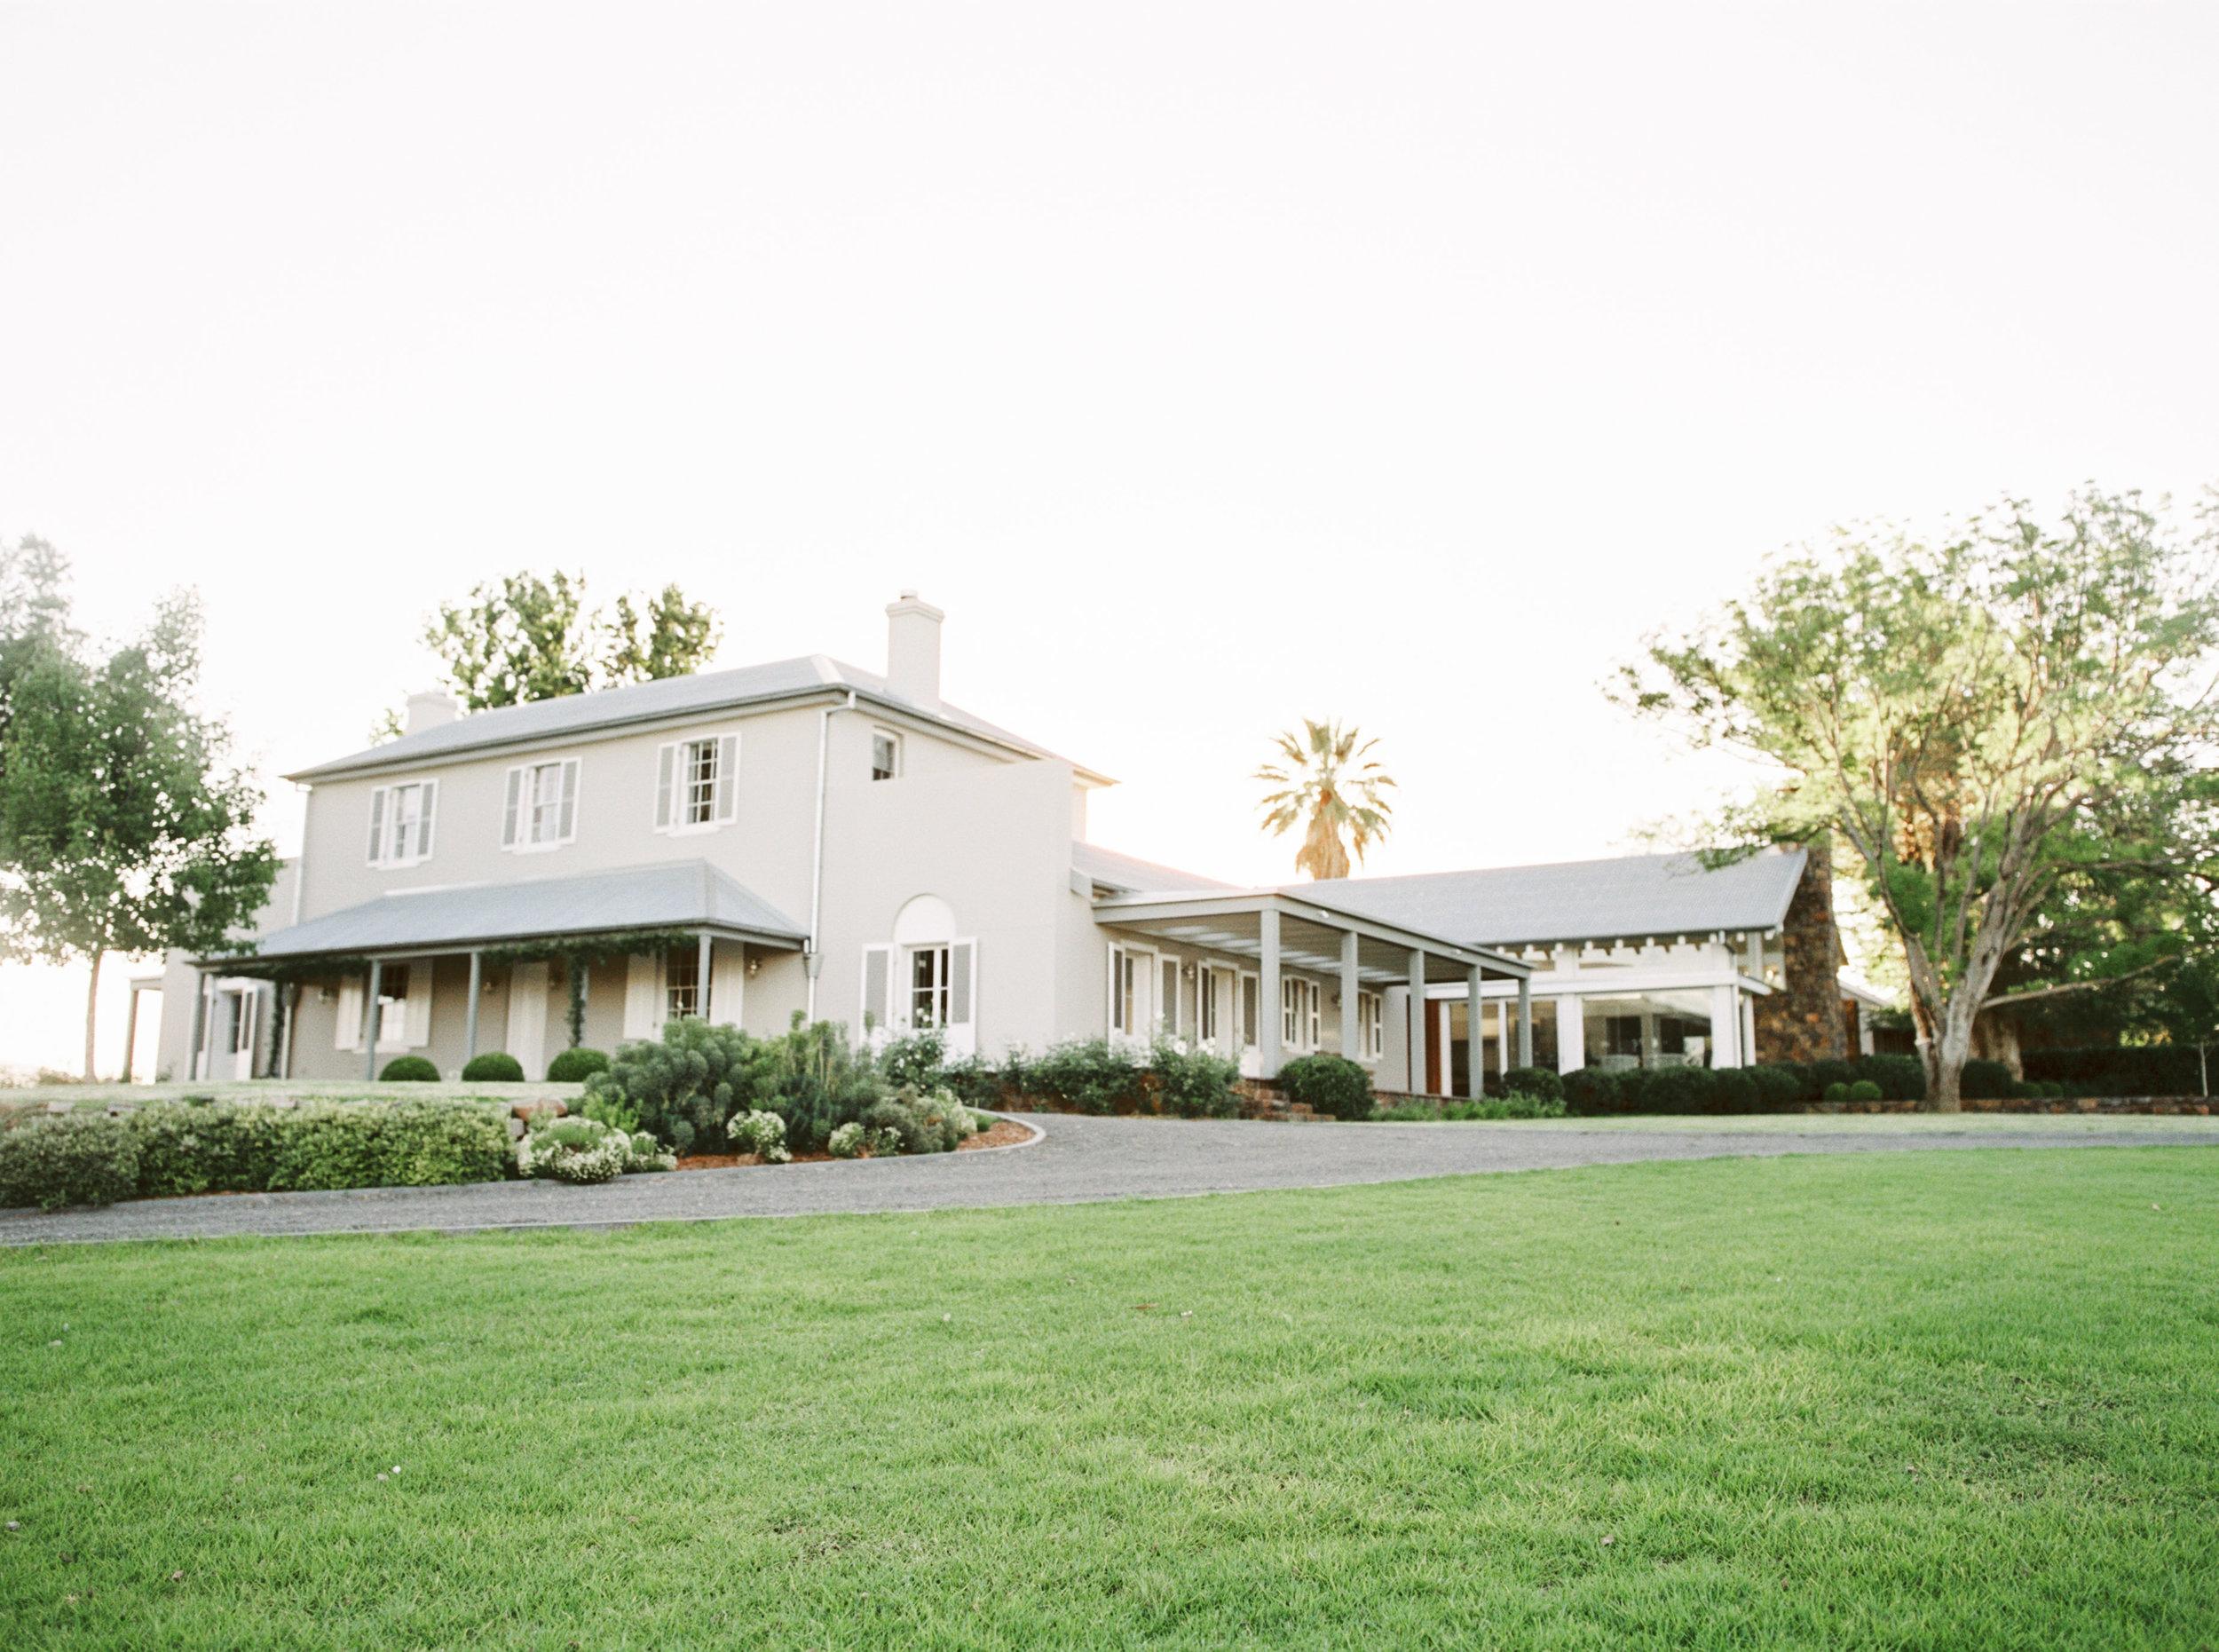 Goonoo Goonoo Station Wedding Photographer Sheri McMahon - NSW wedding venue Goonoo Goonoo Station - best Luxury Wedding Venues Australia